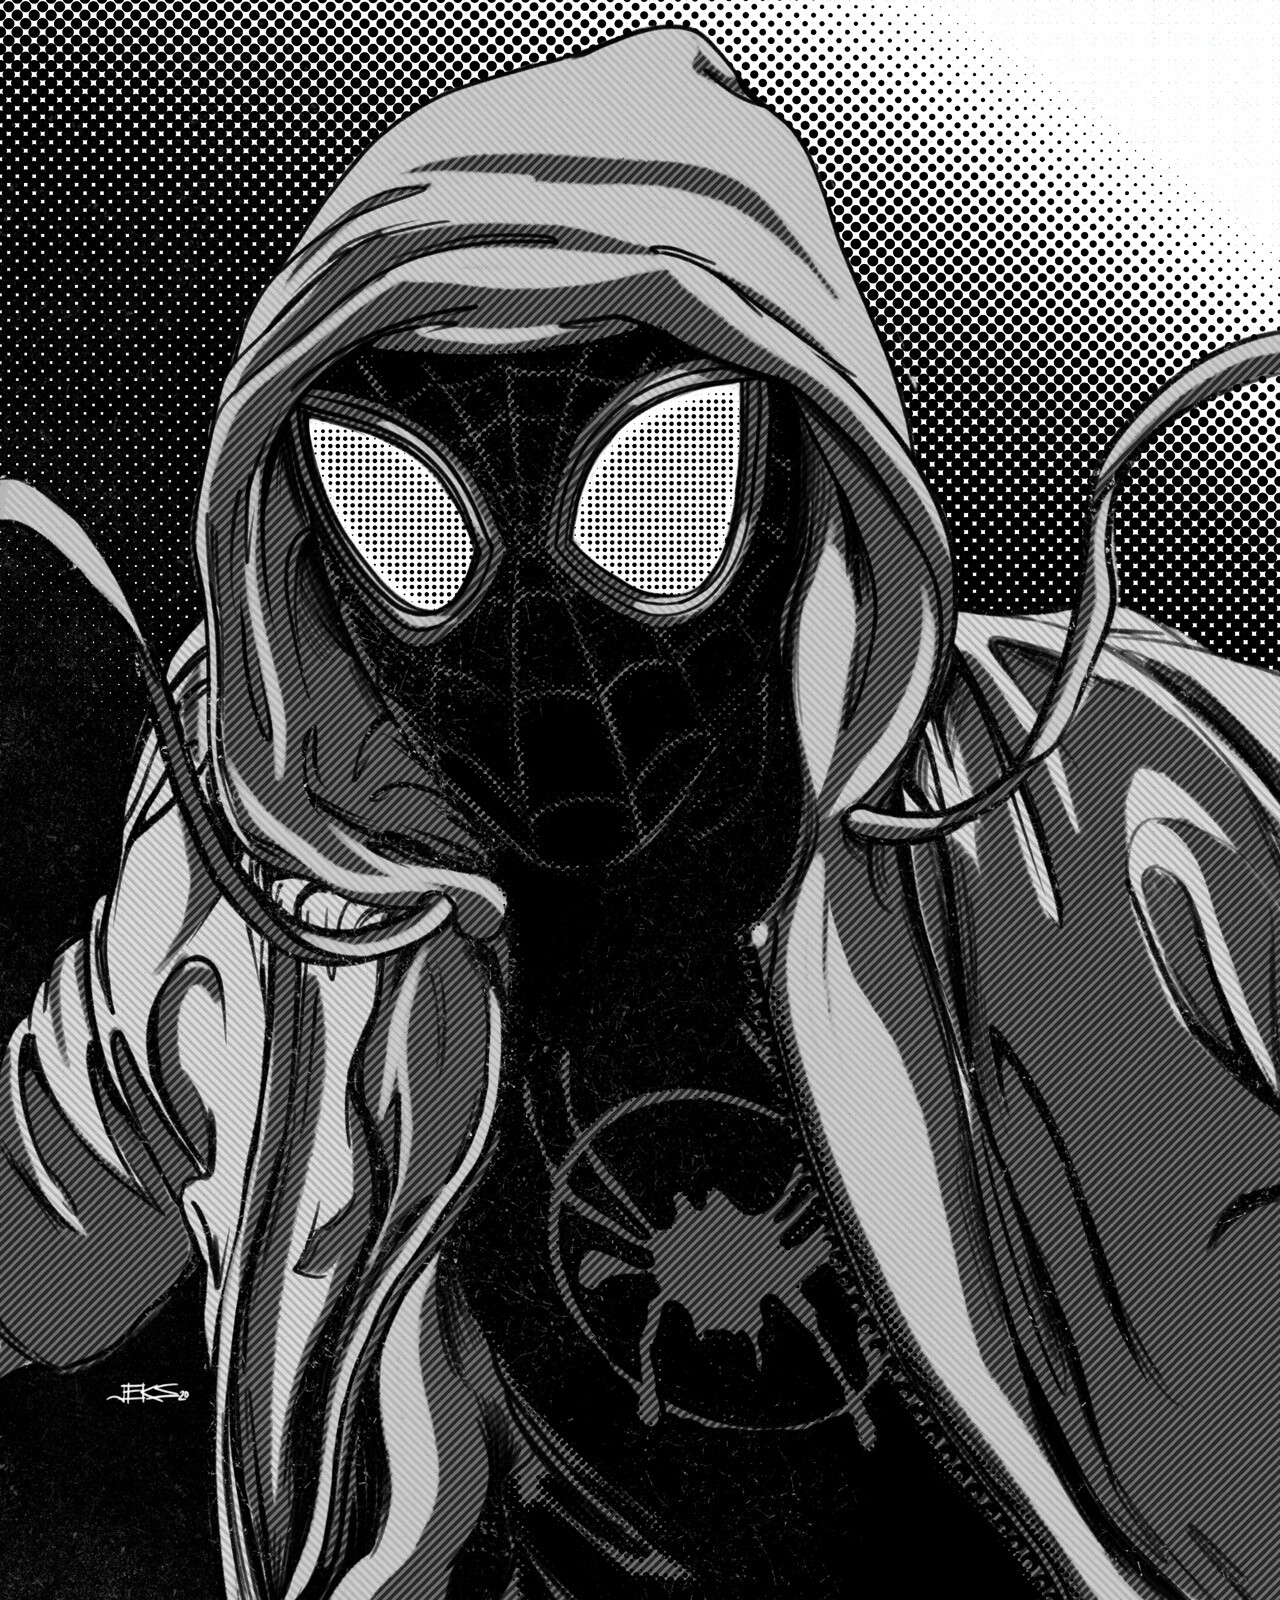 6 - Miles Morales of Marvel Comics